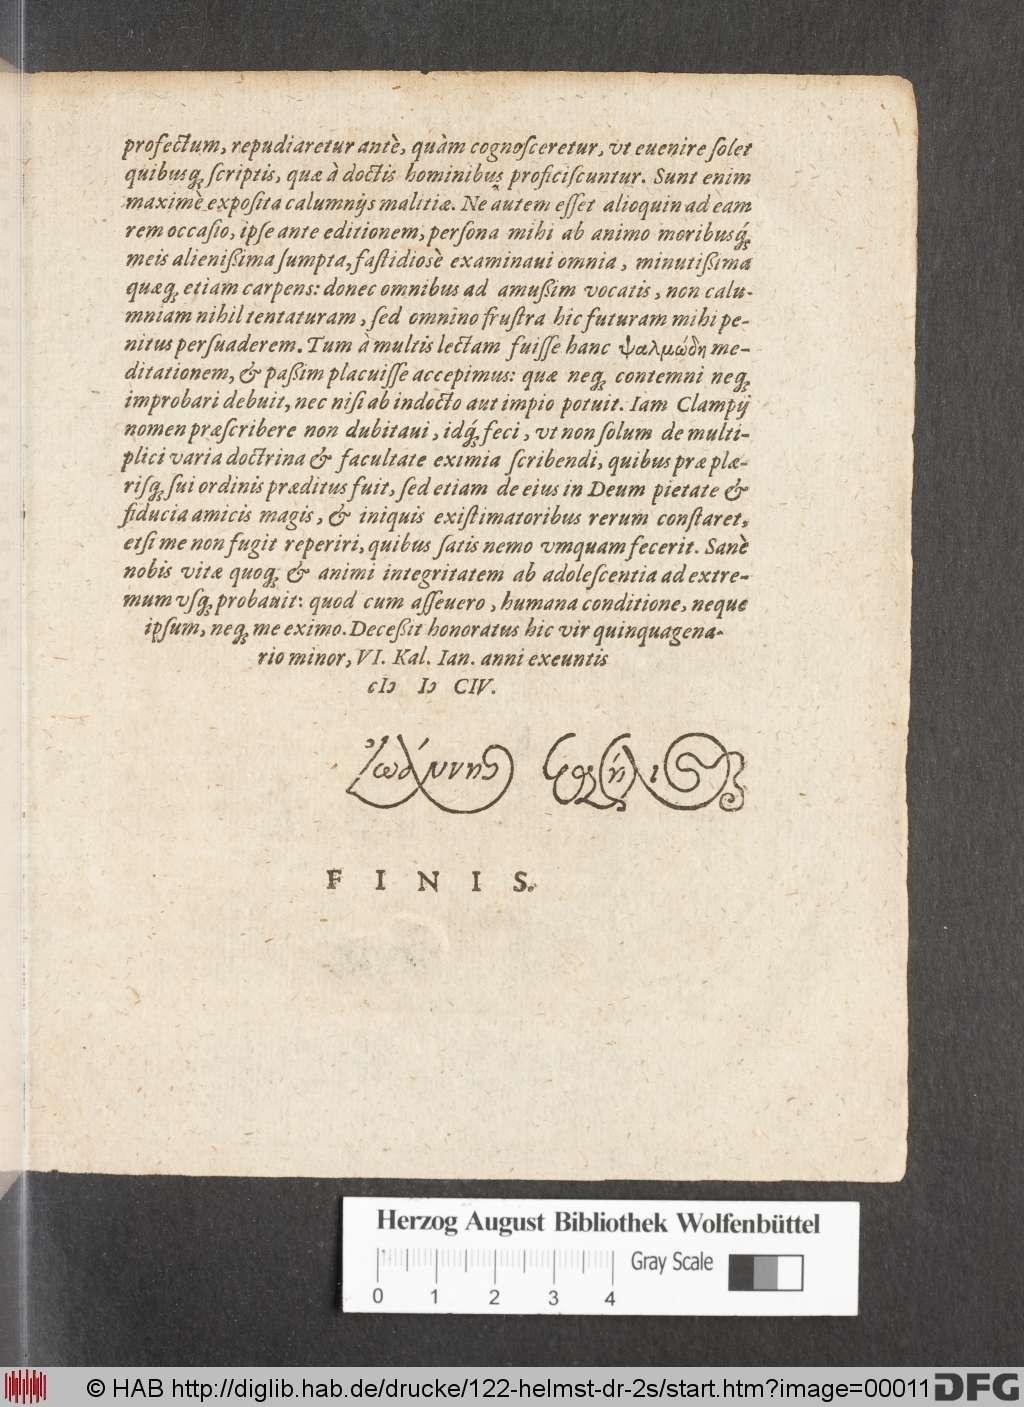 http://diglib.hab.de/drucke/122-helmst-dr-2s/00011.jpg